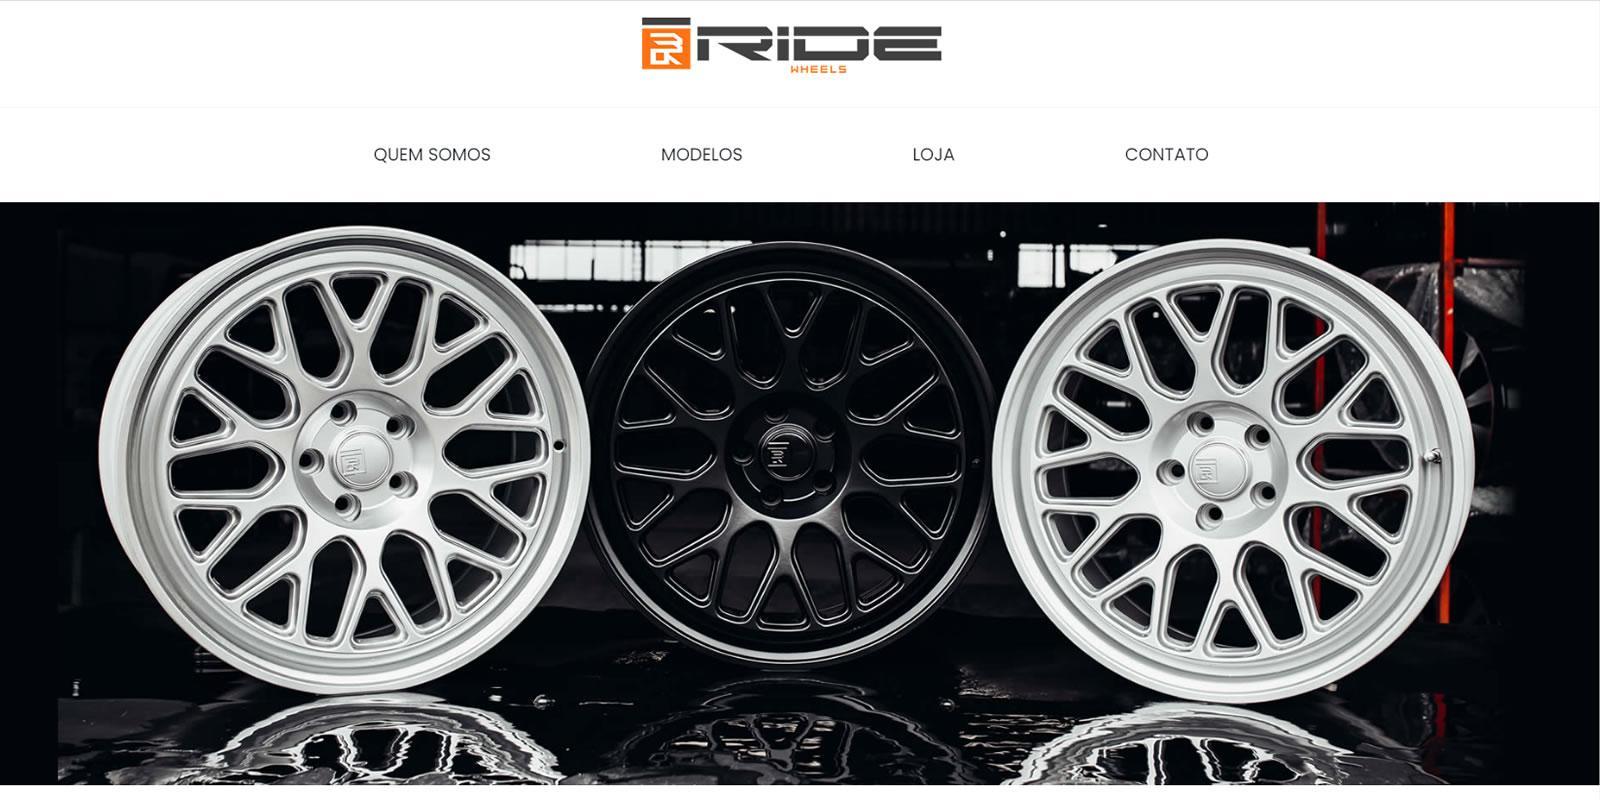 Ride Wheels Rodas Esportivas